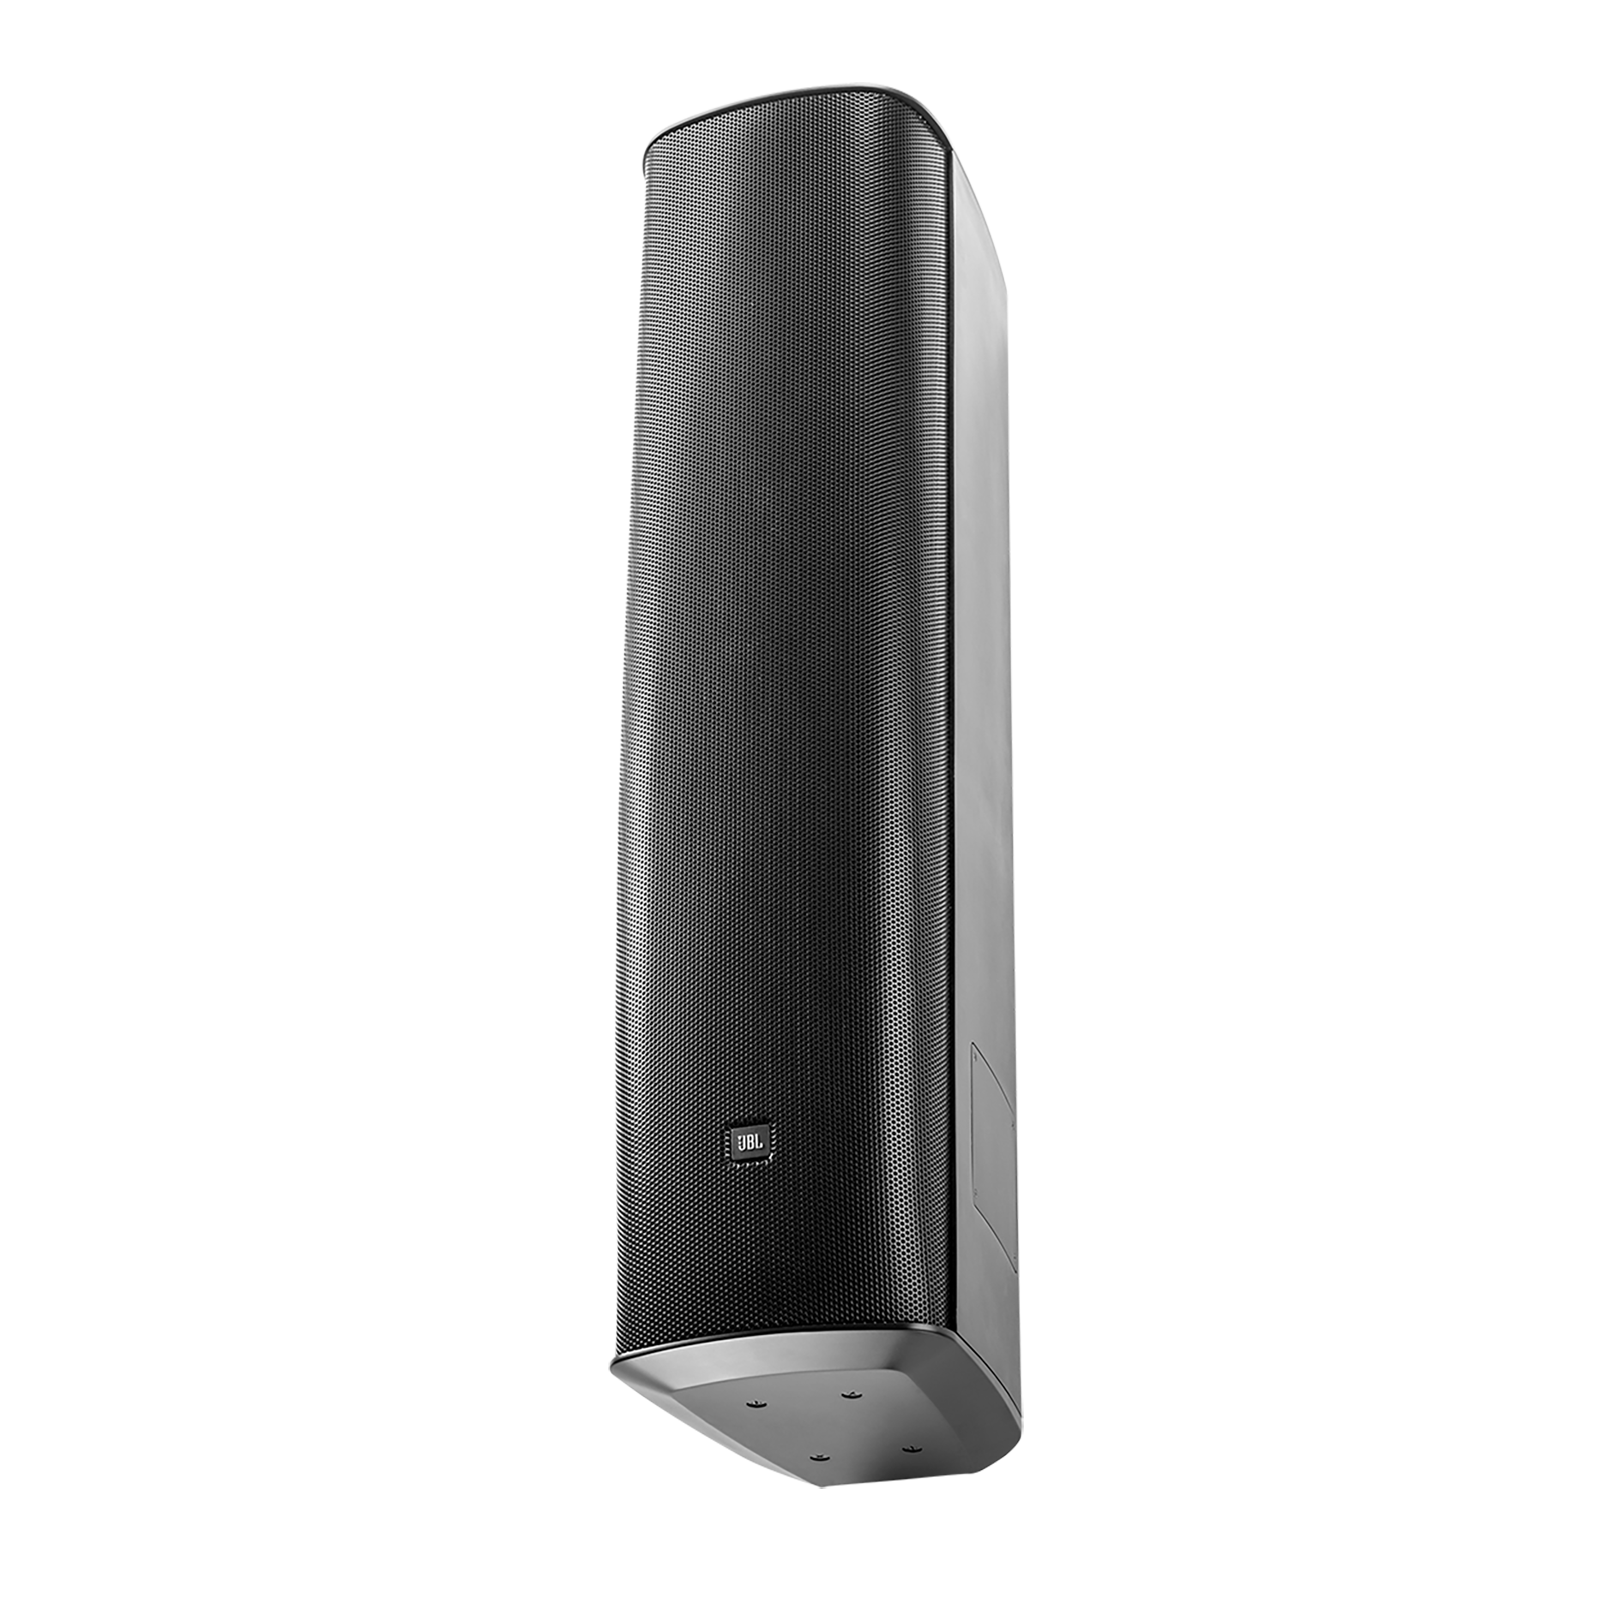 JBL CBT 1000 (B-Stock) - Black - Constant Beamwidth Technology ™ Adjustable Coverage Line Array Column - Detailshot 1